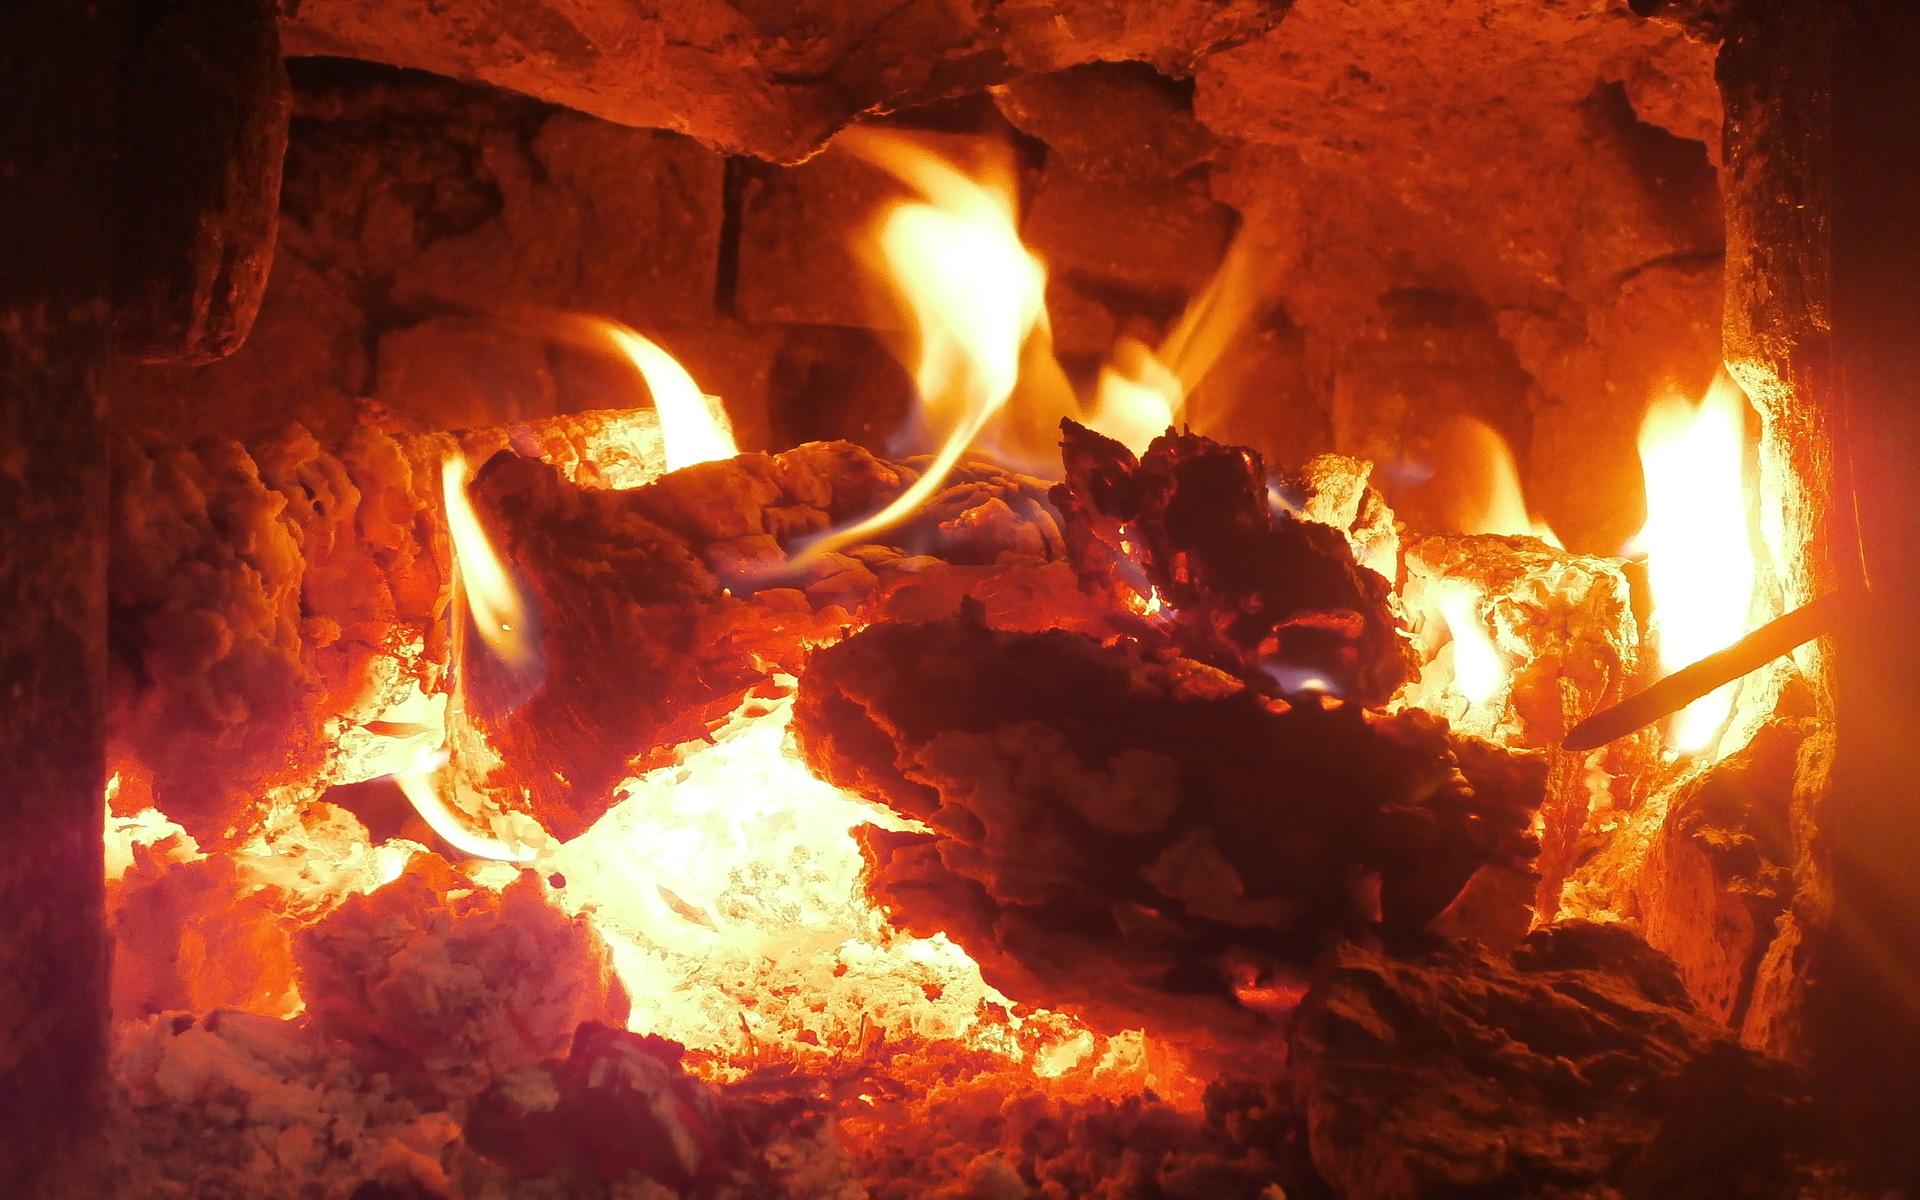 огонь в печи, дрова